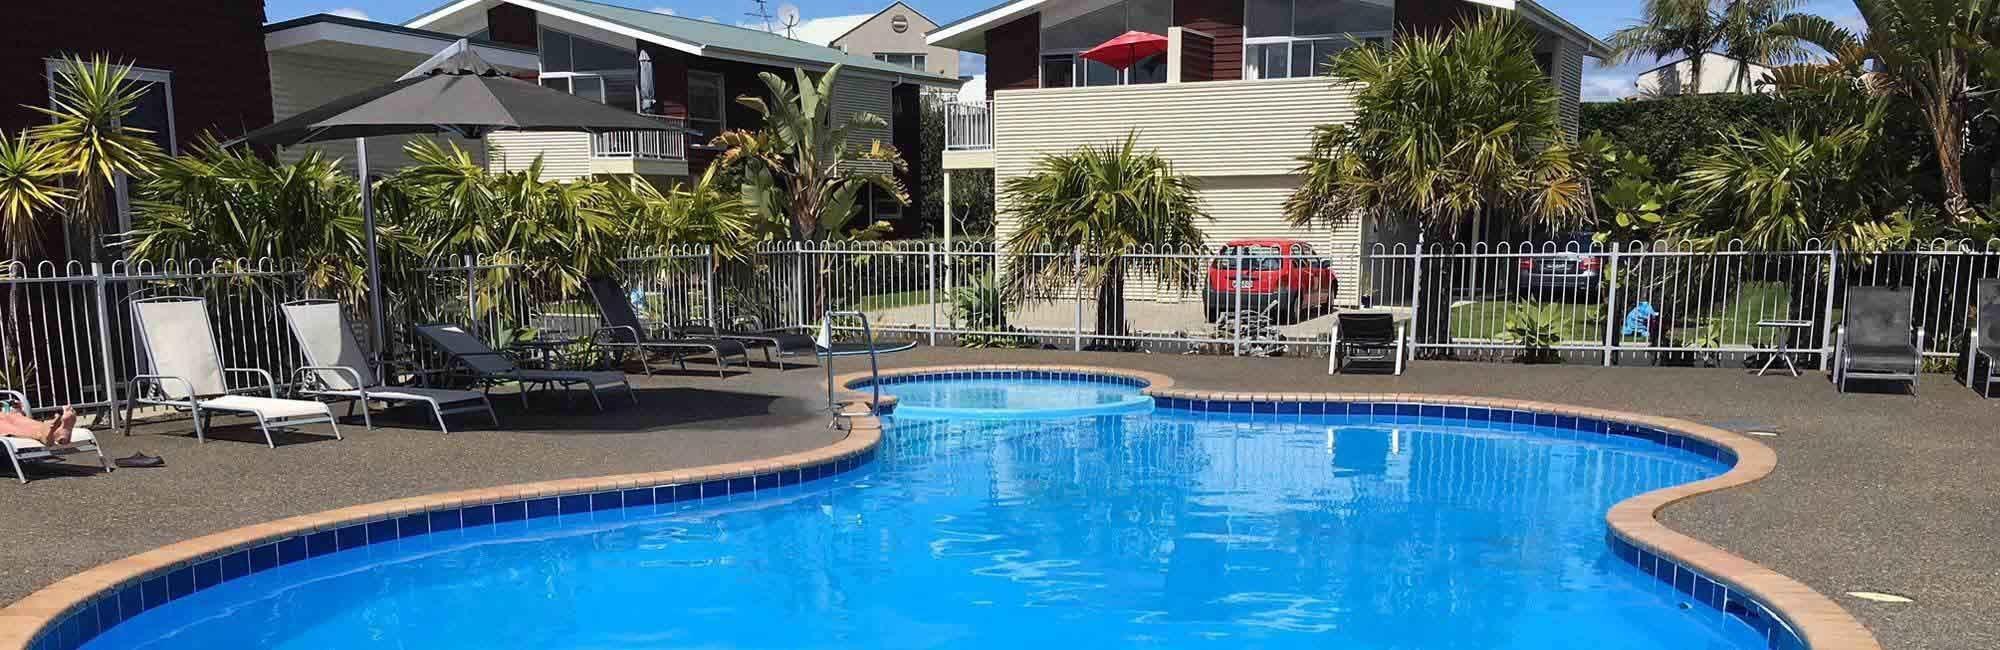 Ocean Serenity Apartments | Whitianga accommodation ...